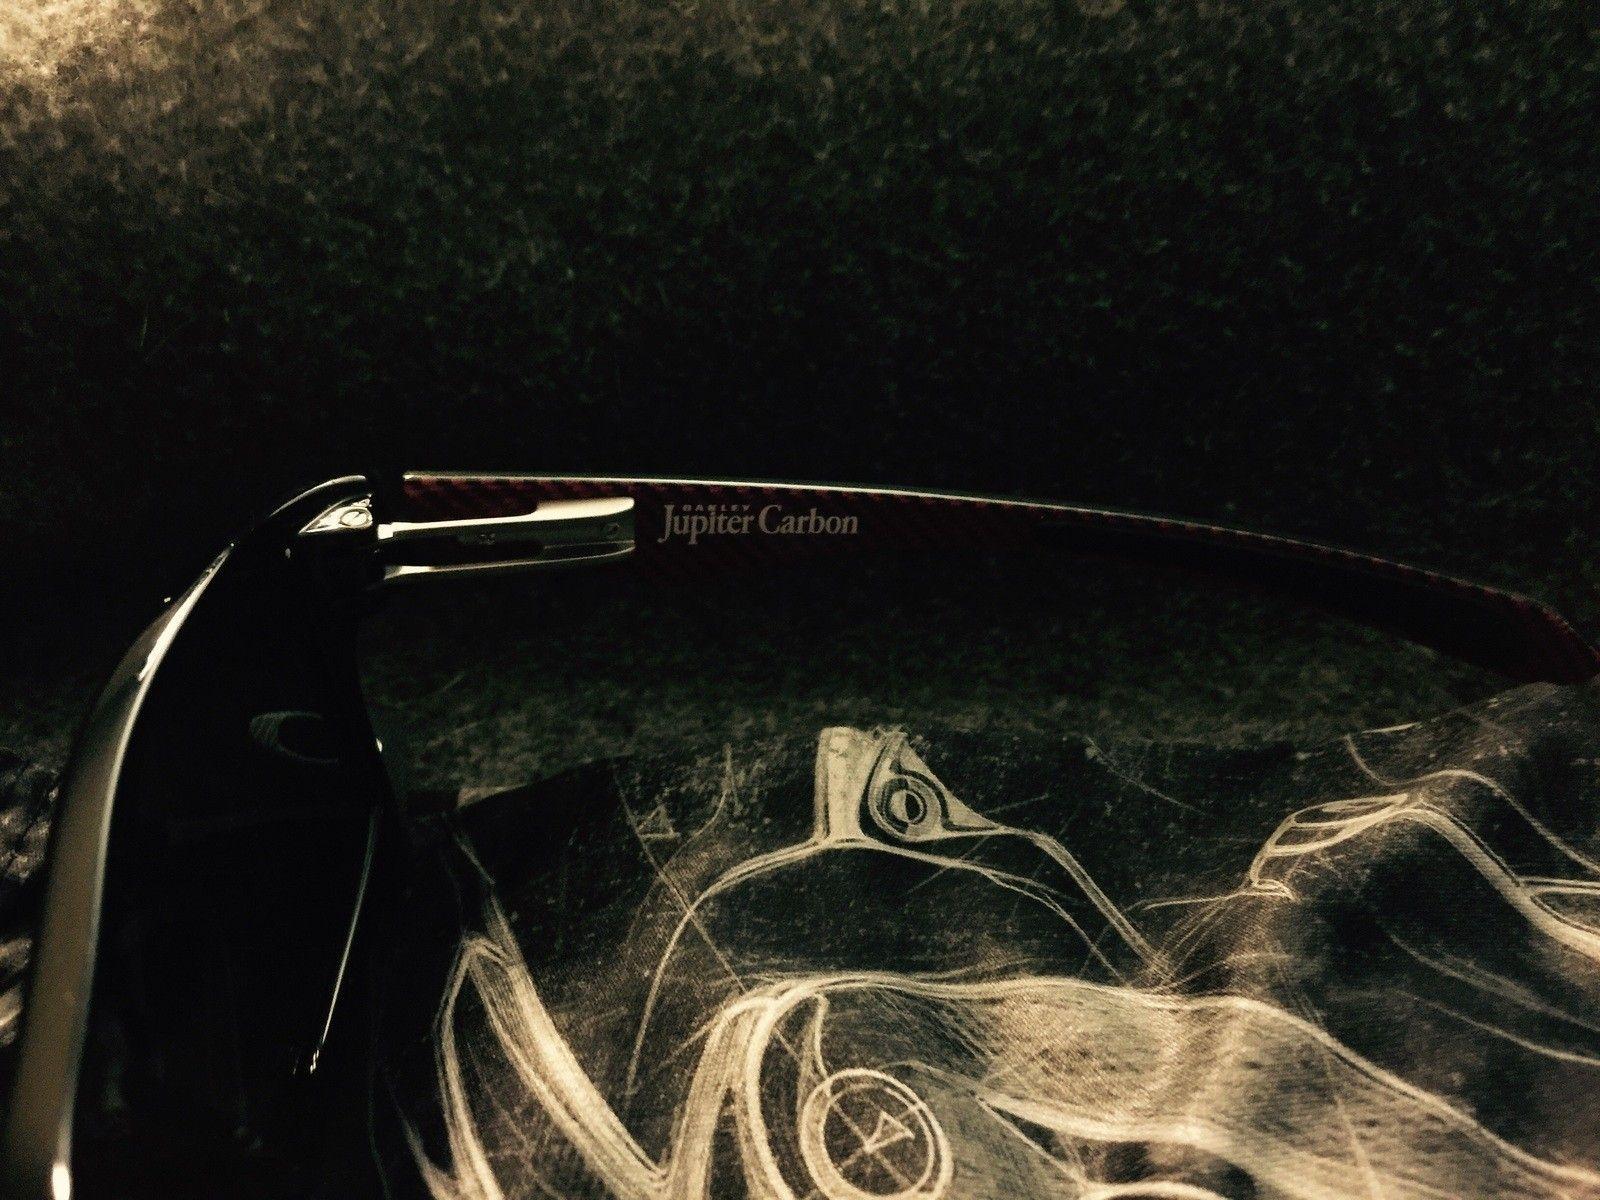 Ferrari Carbon Blade & HDPolarizedJupiter Carbon  Trade For X Metal - image.jpg